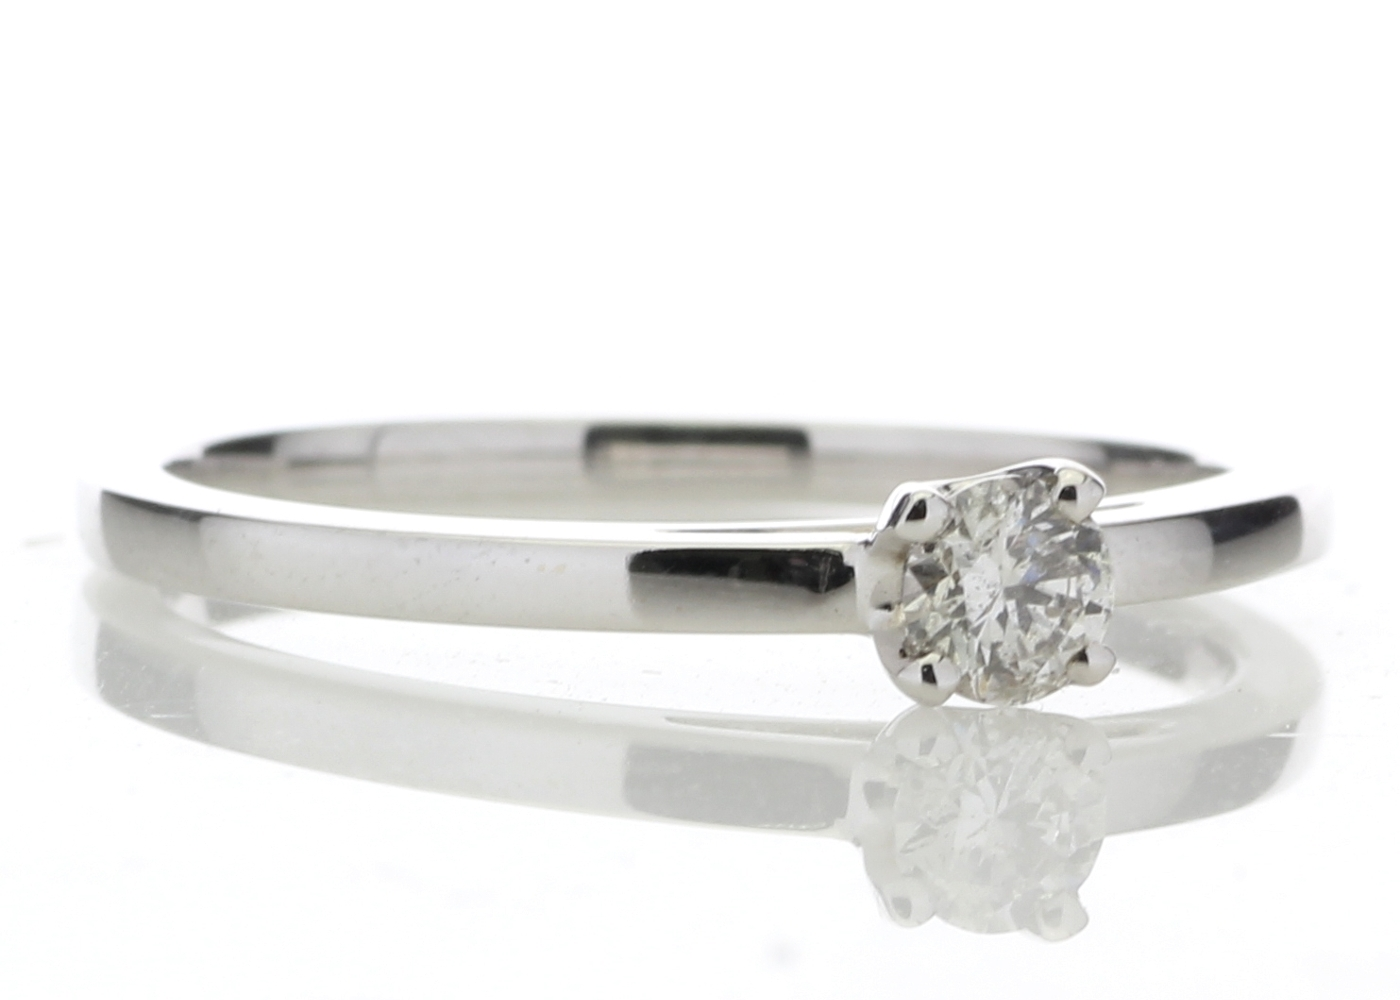 18ct White Gold Single Stone Wire Set Diamond Ring 0.20 Carats - Image 4 of 4